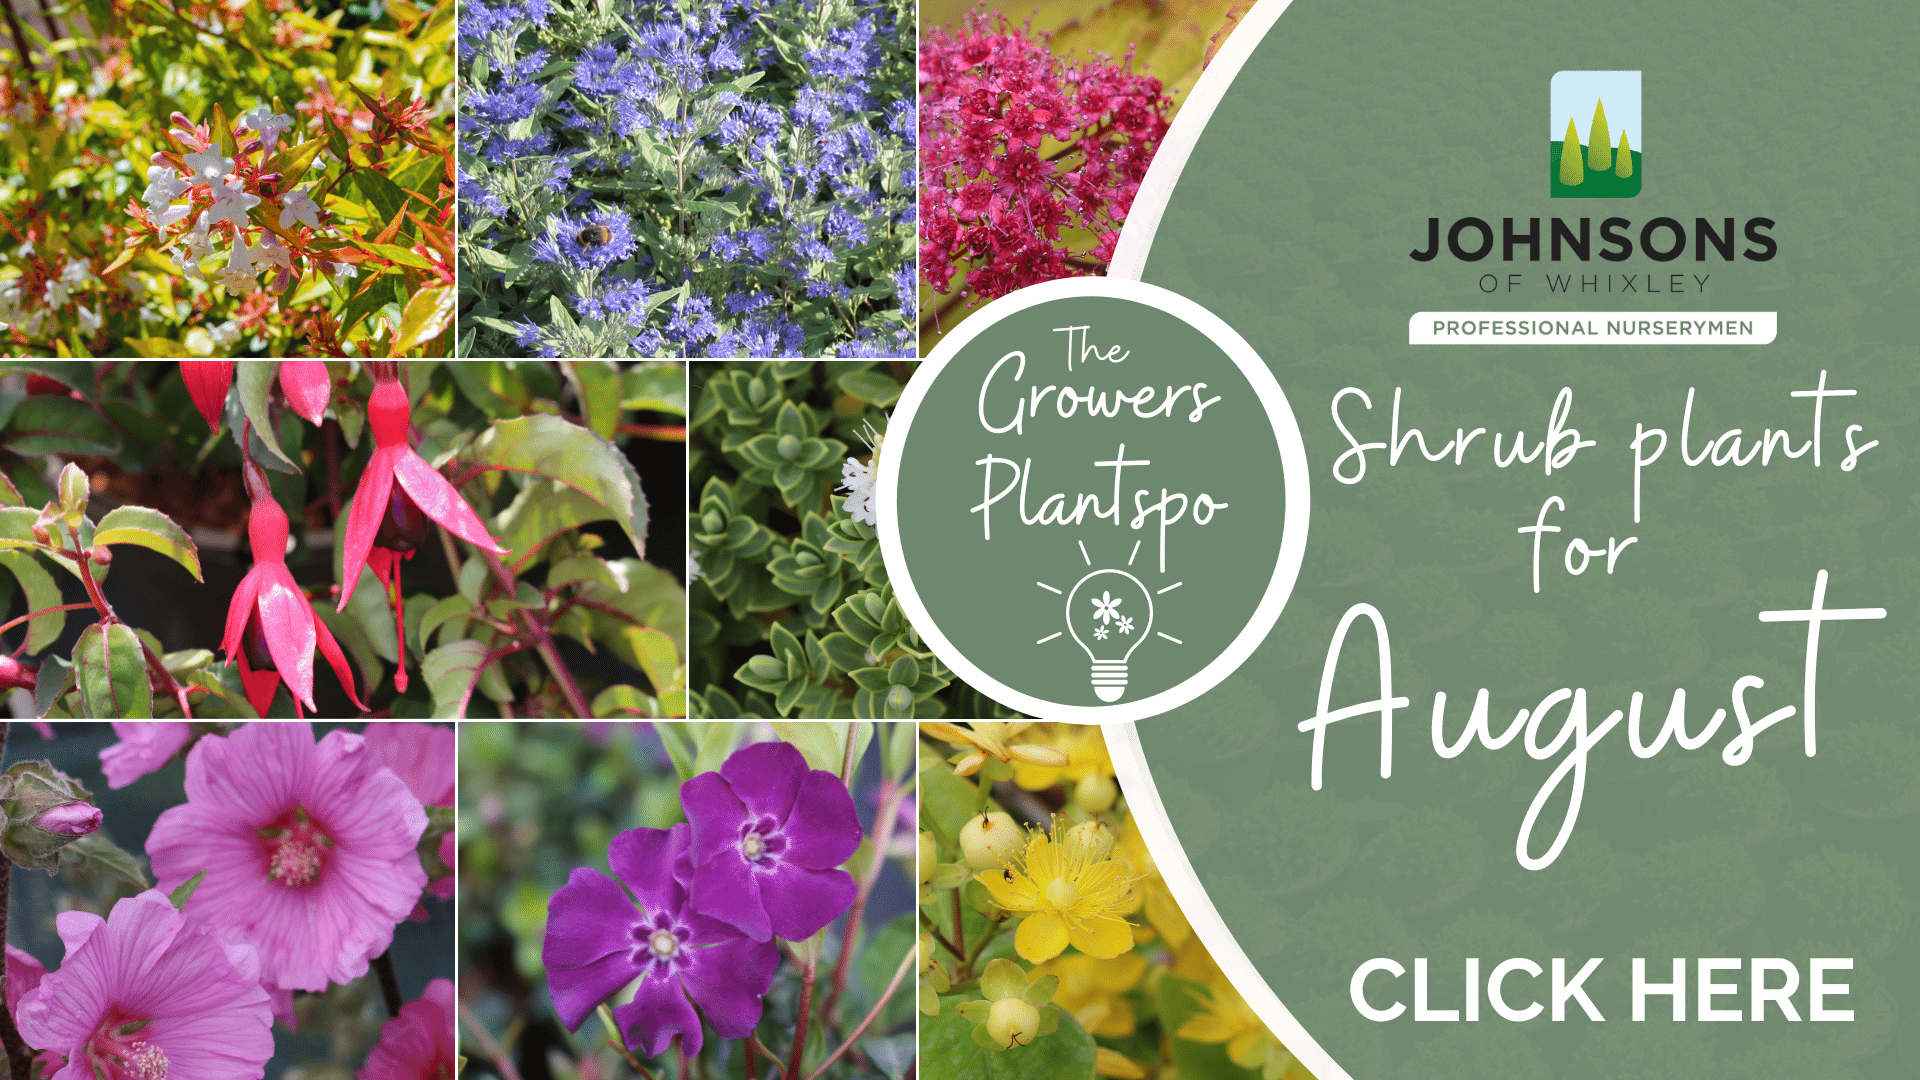 The Growers Plantspo - August Shrubs